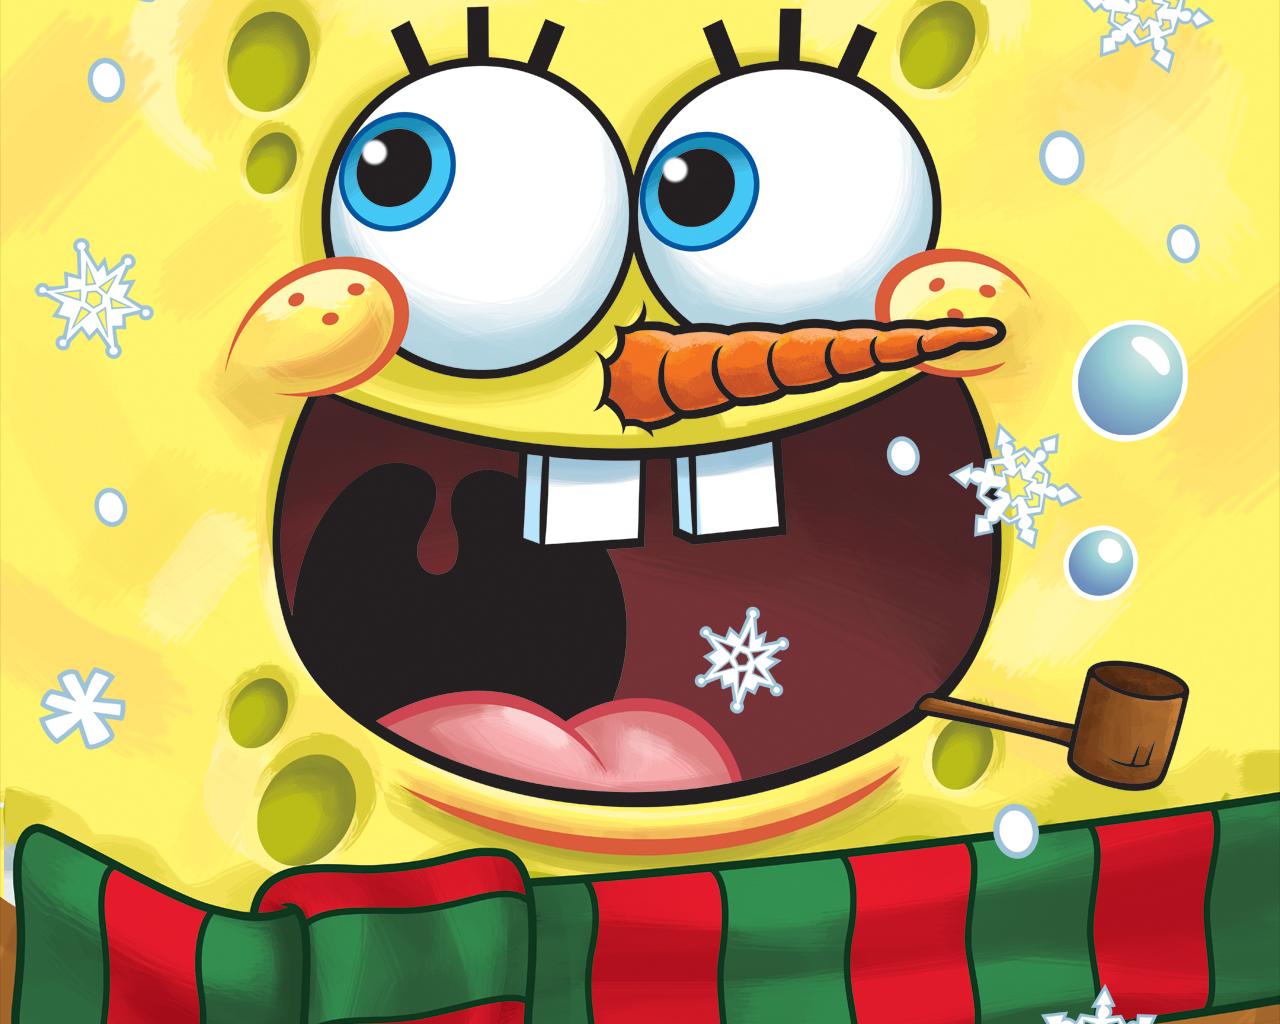 Spongebob Squarepants Images Schwammkopf HD Wallpaper And Background Photos